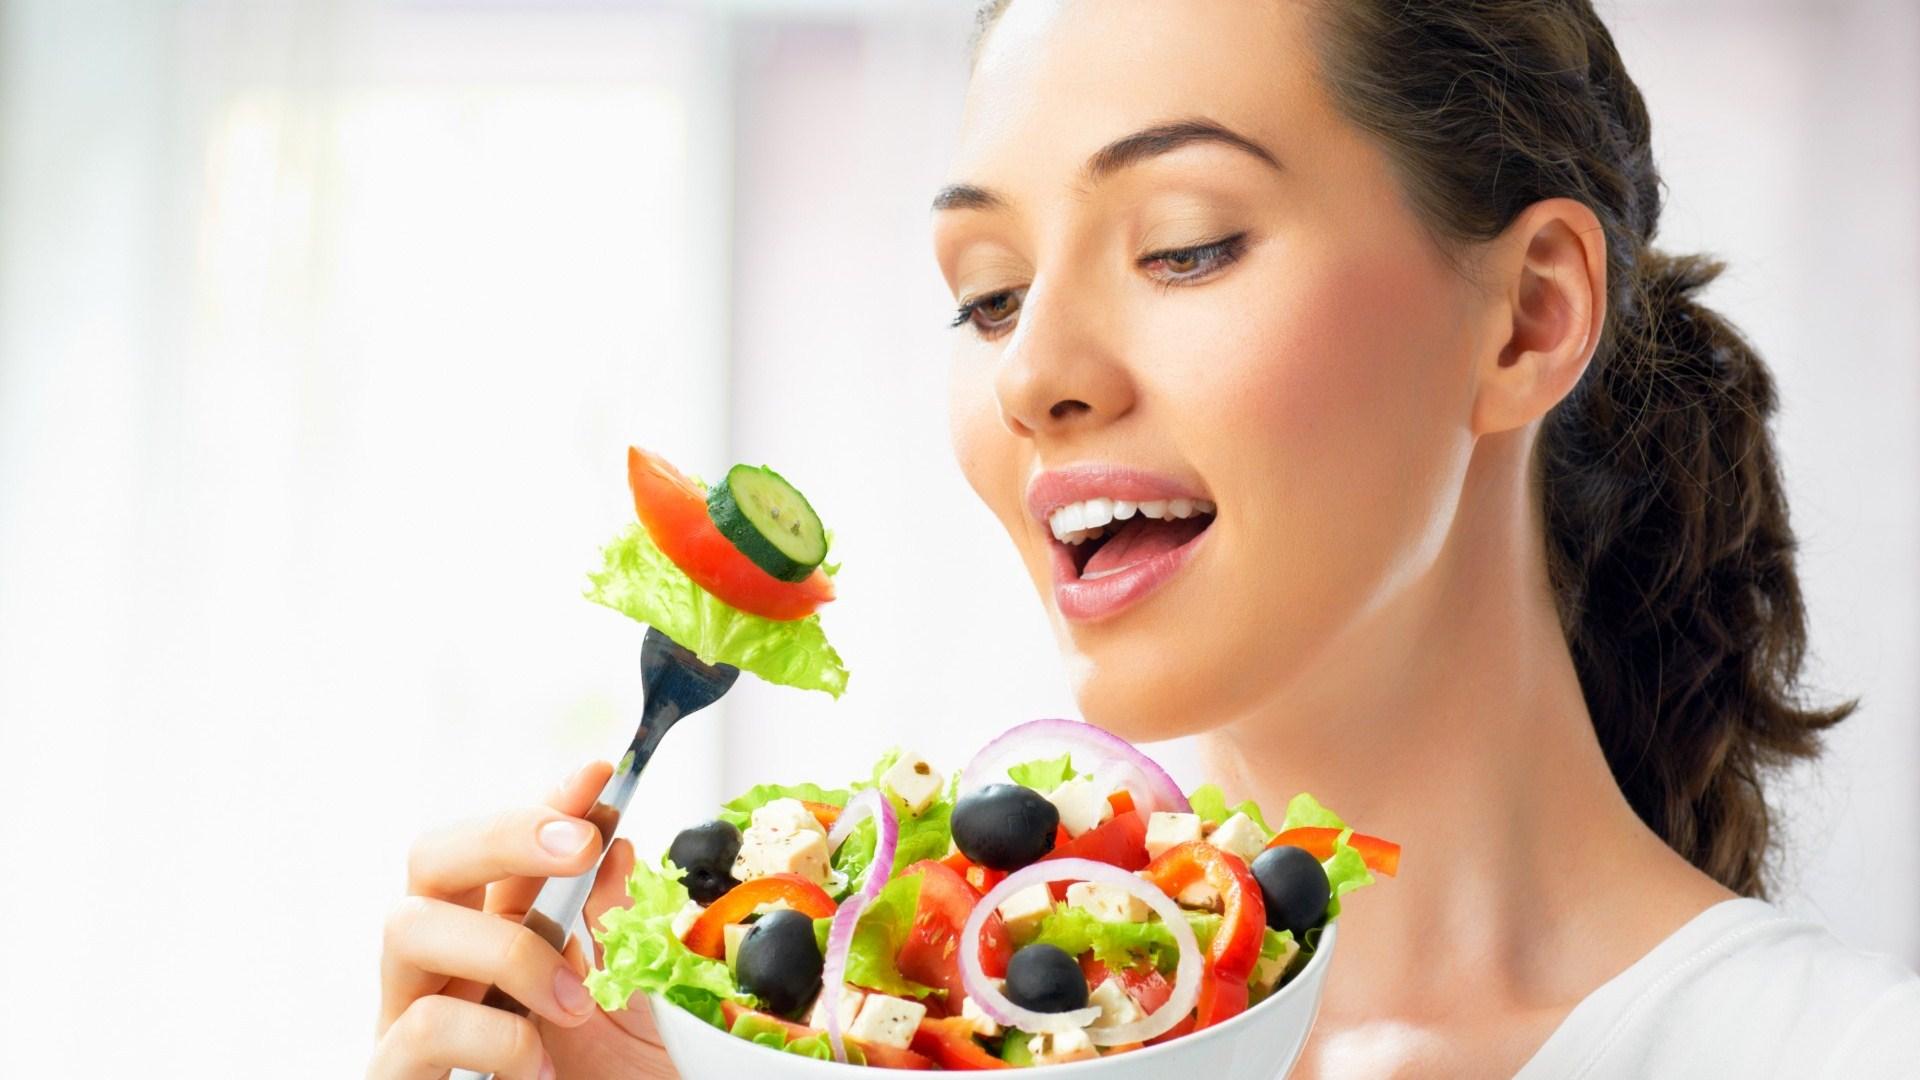 Регулярное Питание Похудение. Питание для похудения — меню на неделю